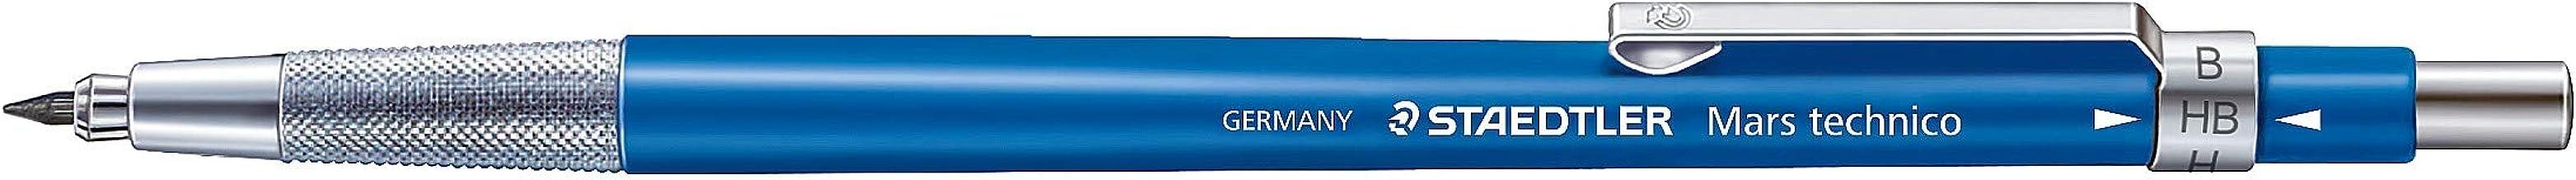 Staedtler 780C Mars Técnico - Portaminas Técnico (HB, 2 mm, Punta Metálica), Color Azul/ Gris